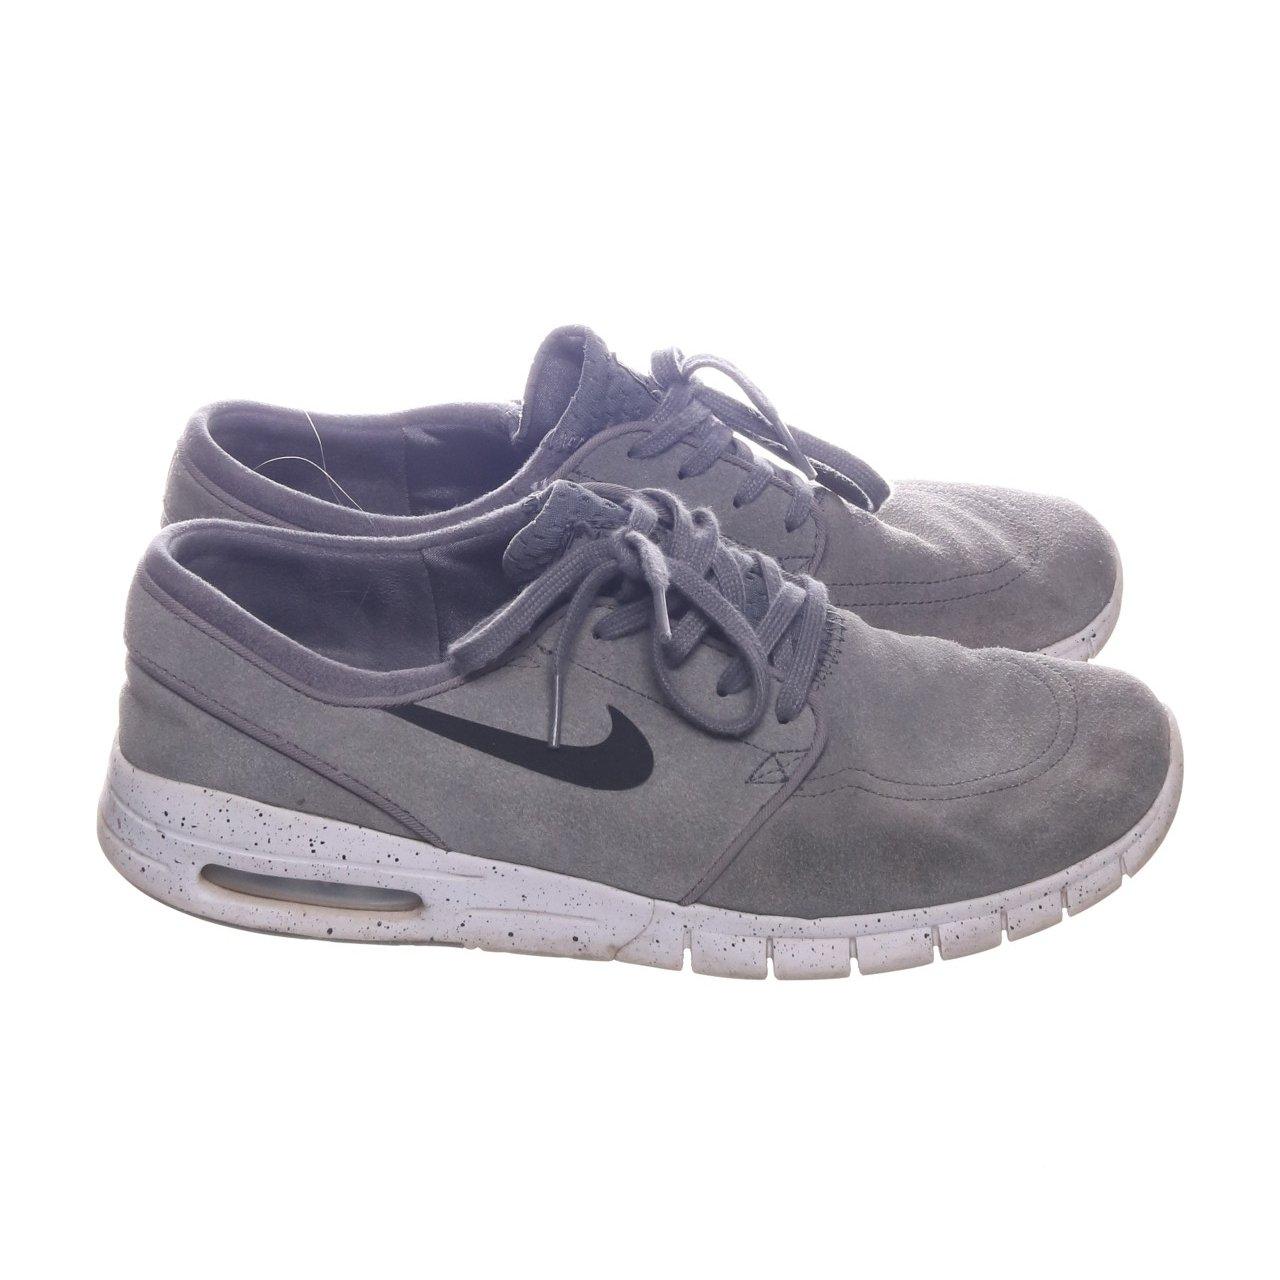 huge discount 19d9e 58d5b Nike SB Stefan Janoski, Sneakers, Strl  44.5, 685299-011, Grå